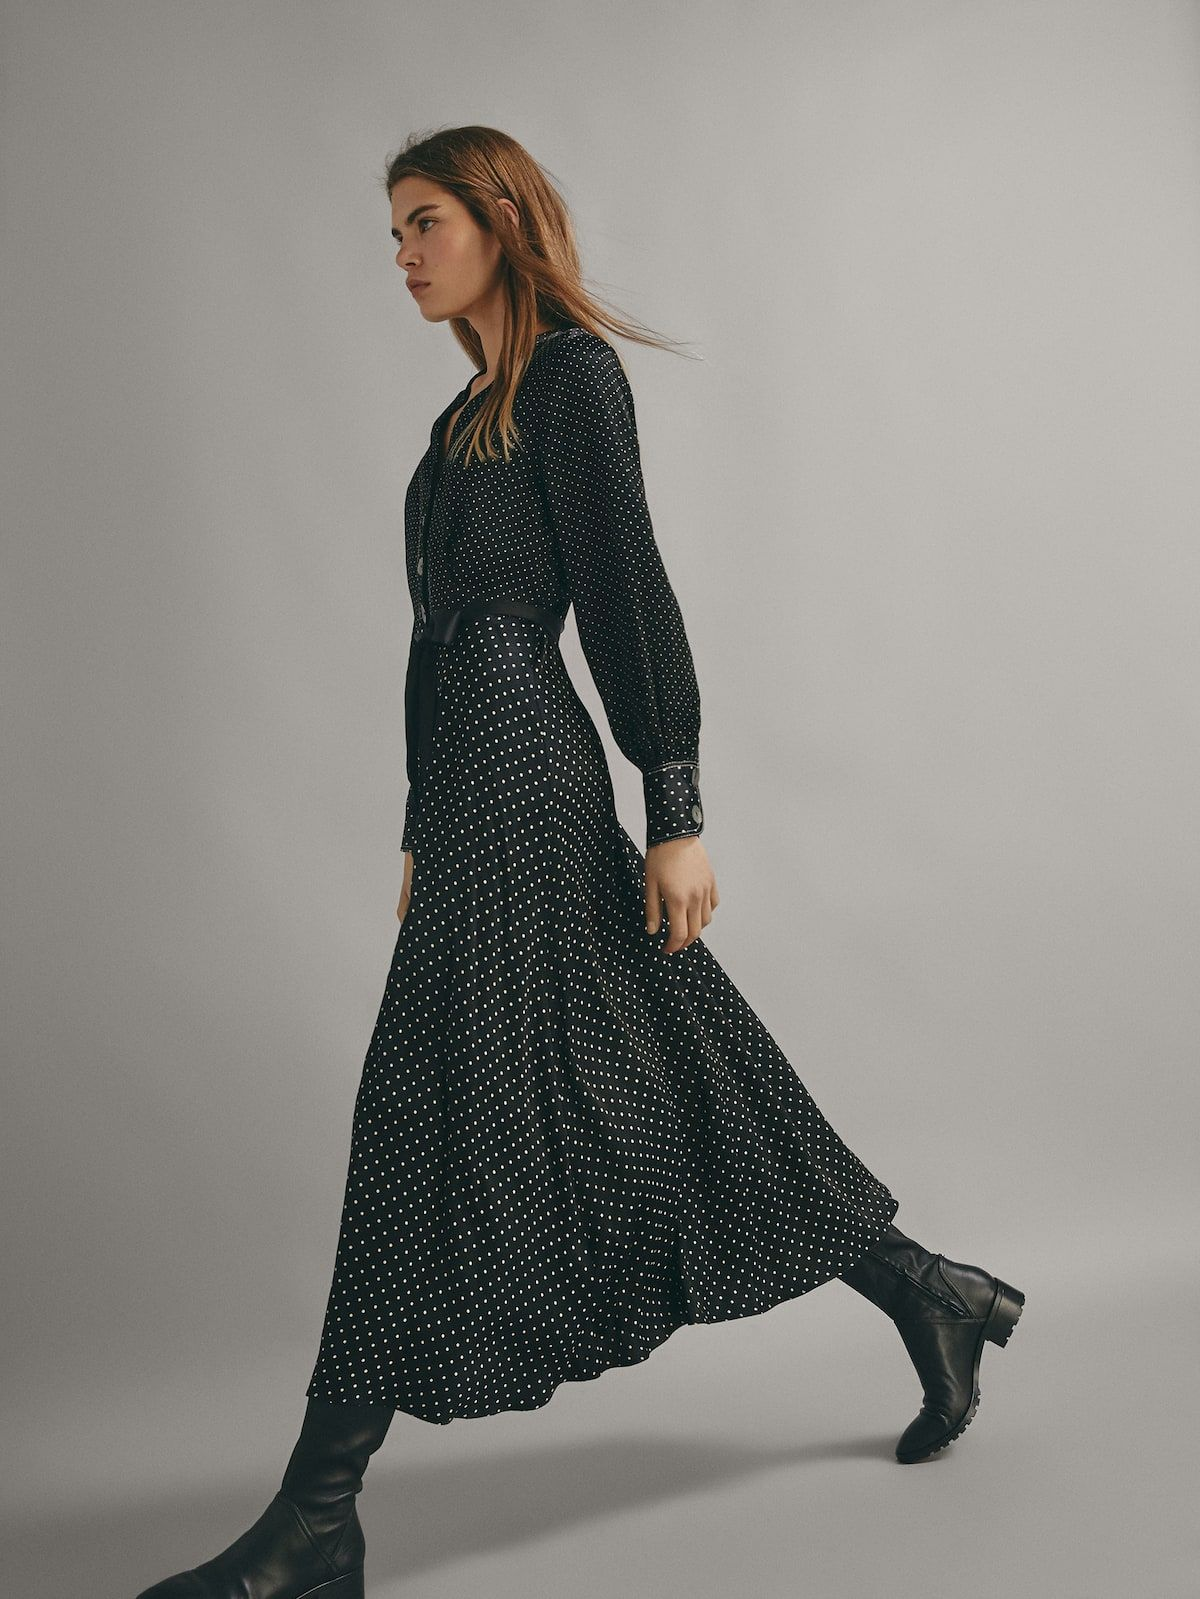 582071ebeaf POLKA DOT PRINT DRESS WITH TIE BELT - Women - Massimo Dutti